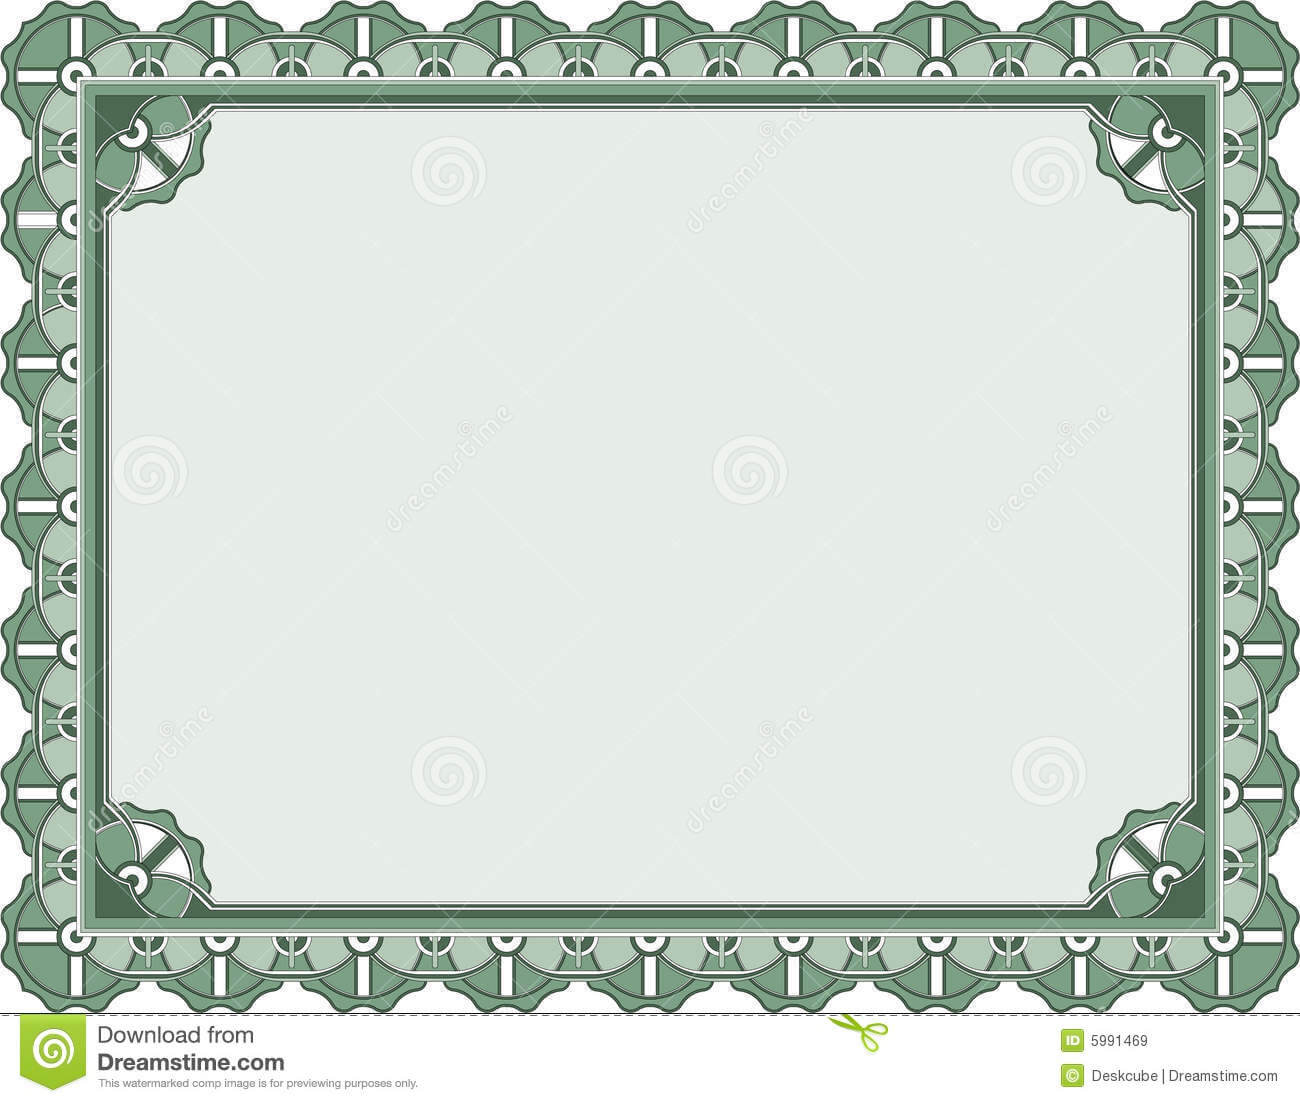 Award Certificate Template Stock Vector. Illustration Of With Award Certificate Border Template